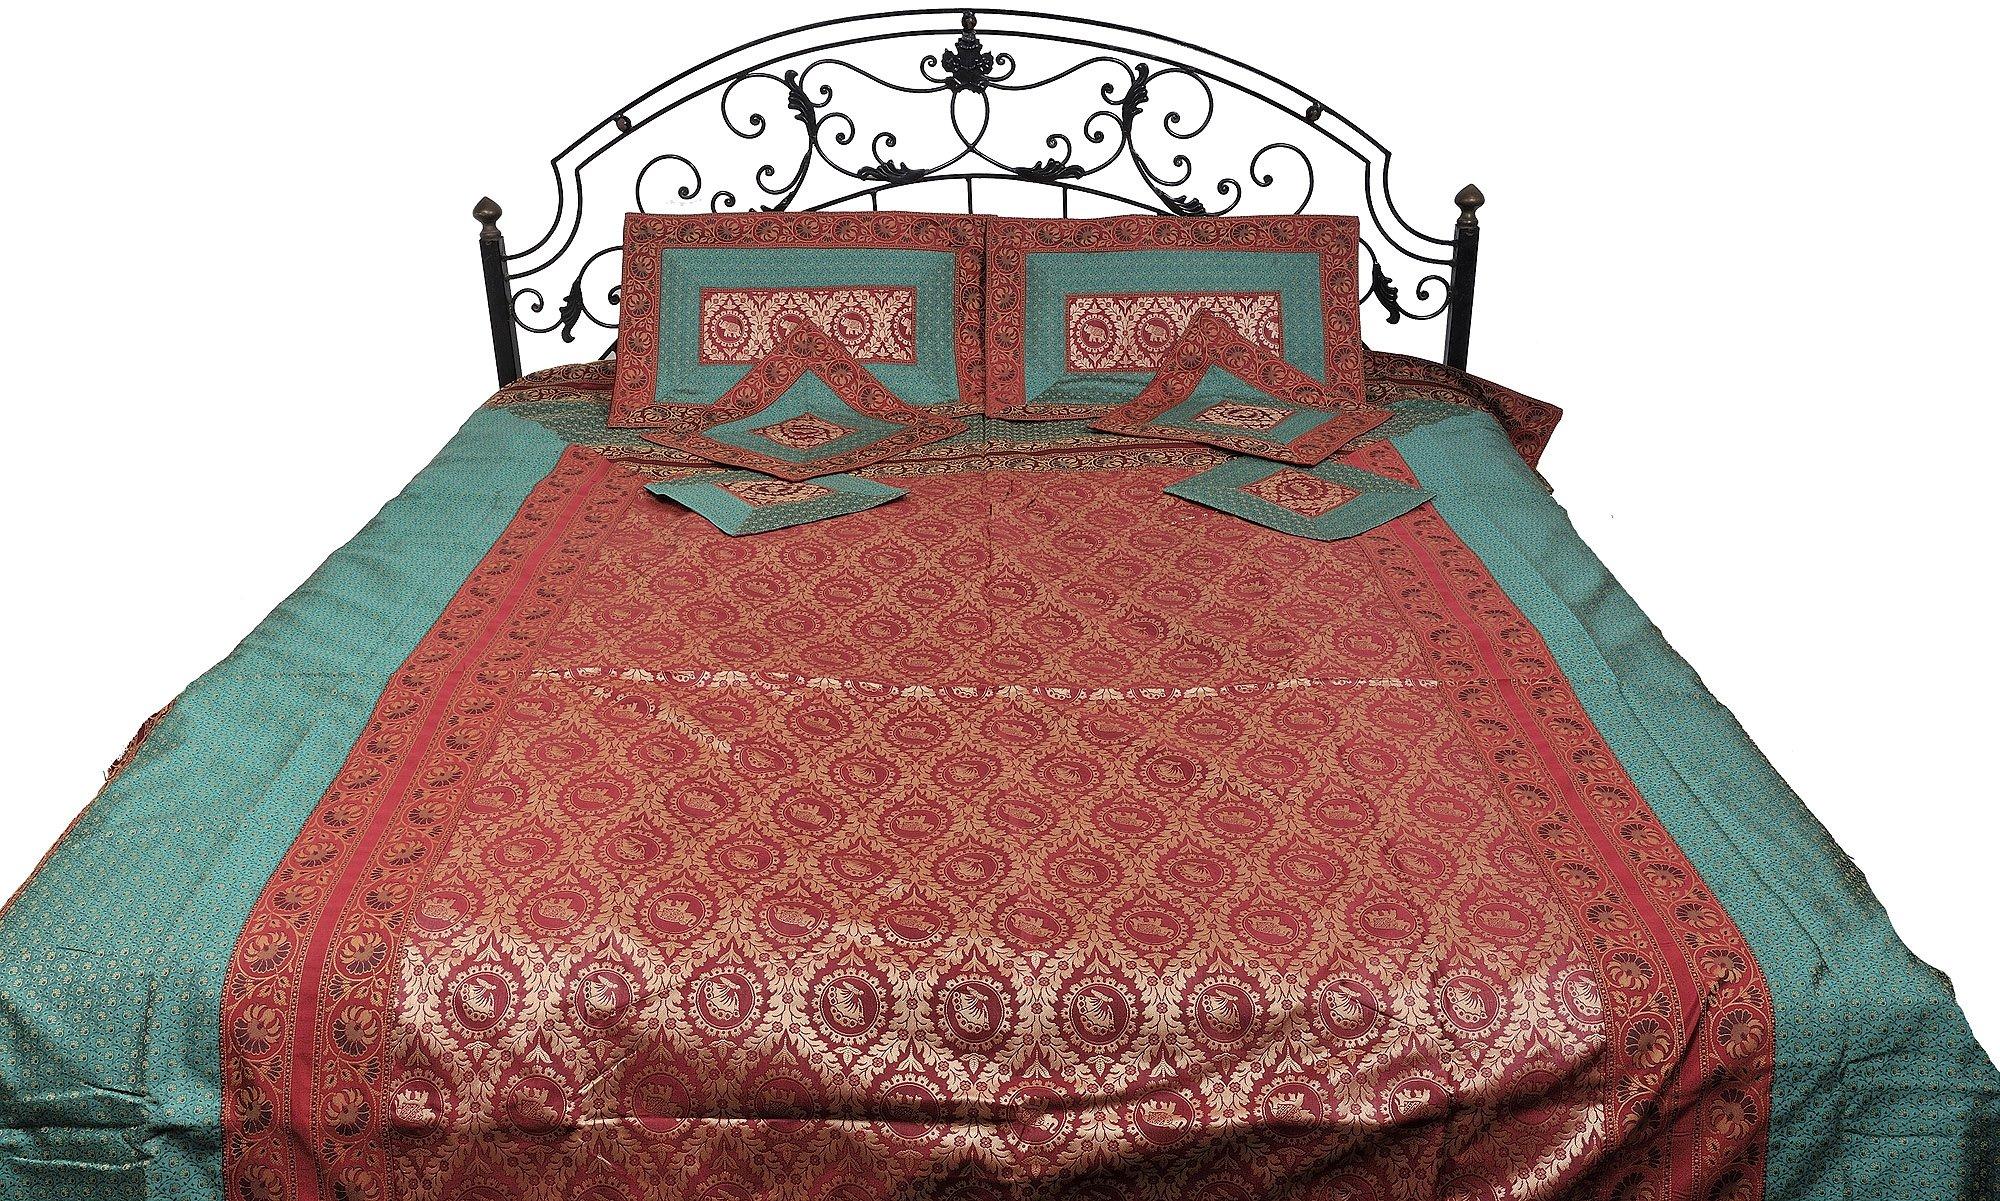 Scarlet and Green Seven-Piece Banarasi Bedspread with woven Elephants and Butterflies - Art Silk wit